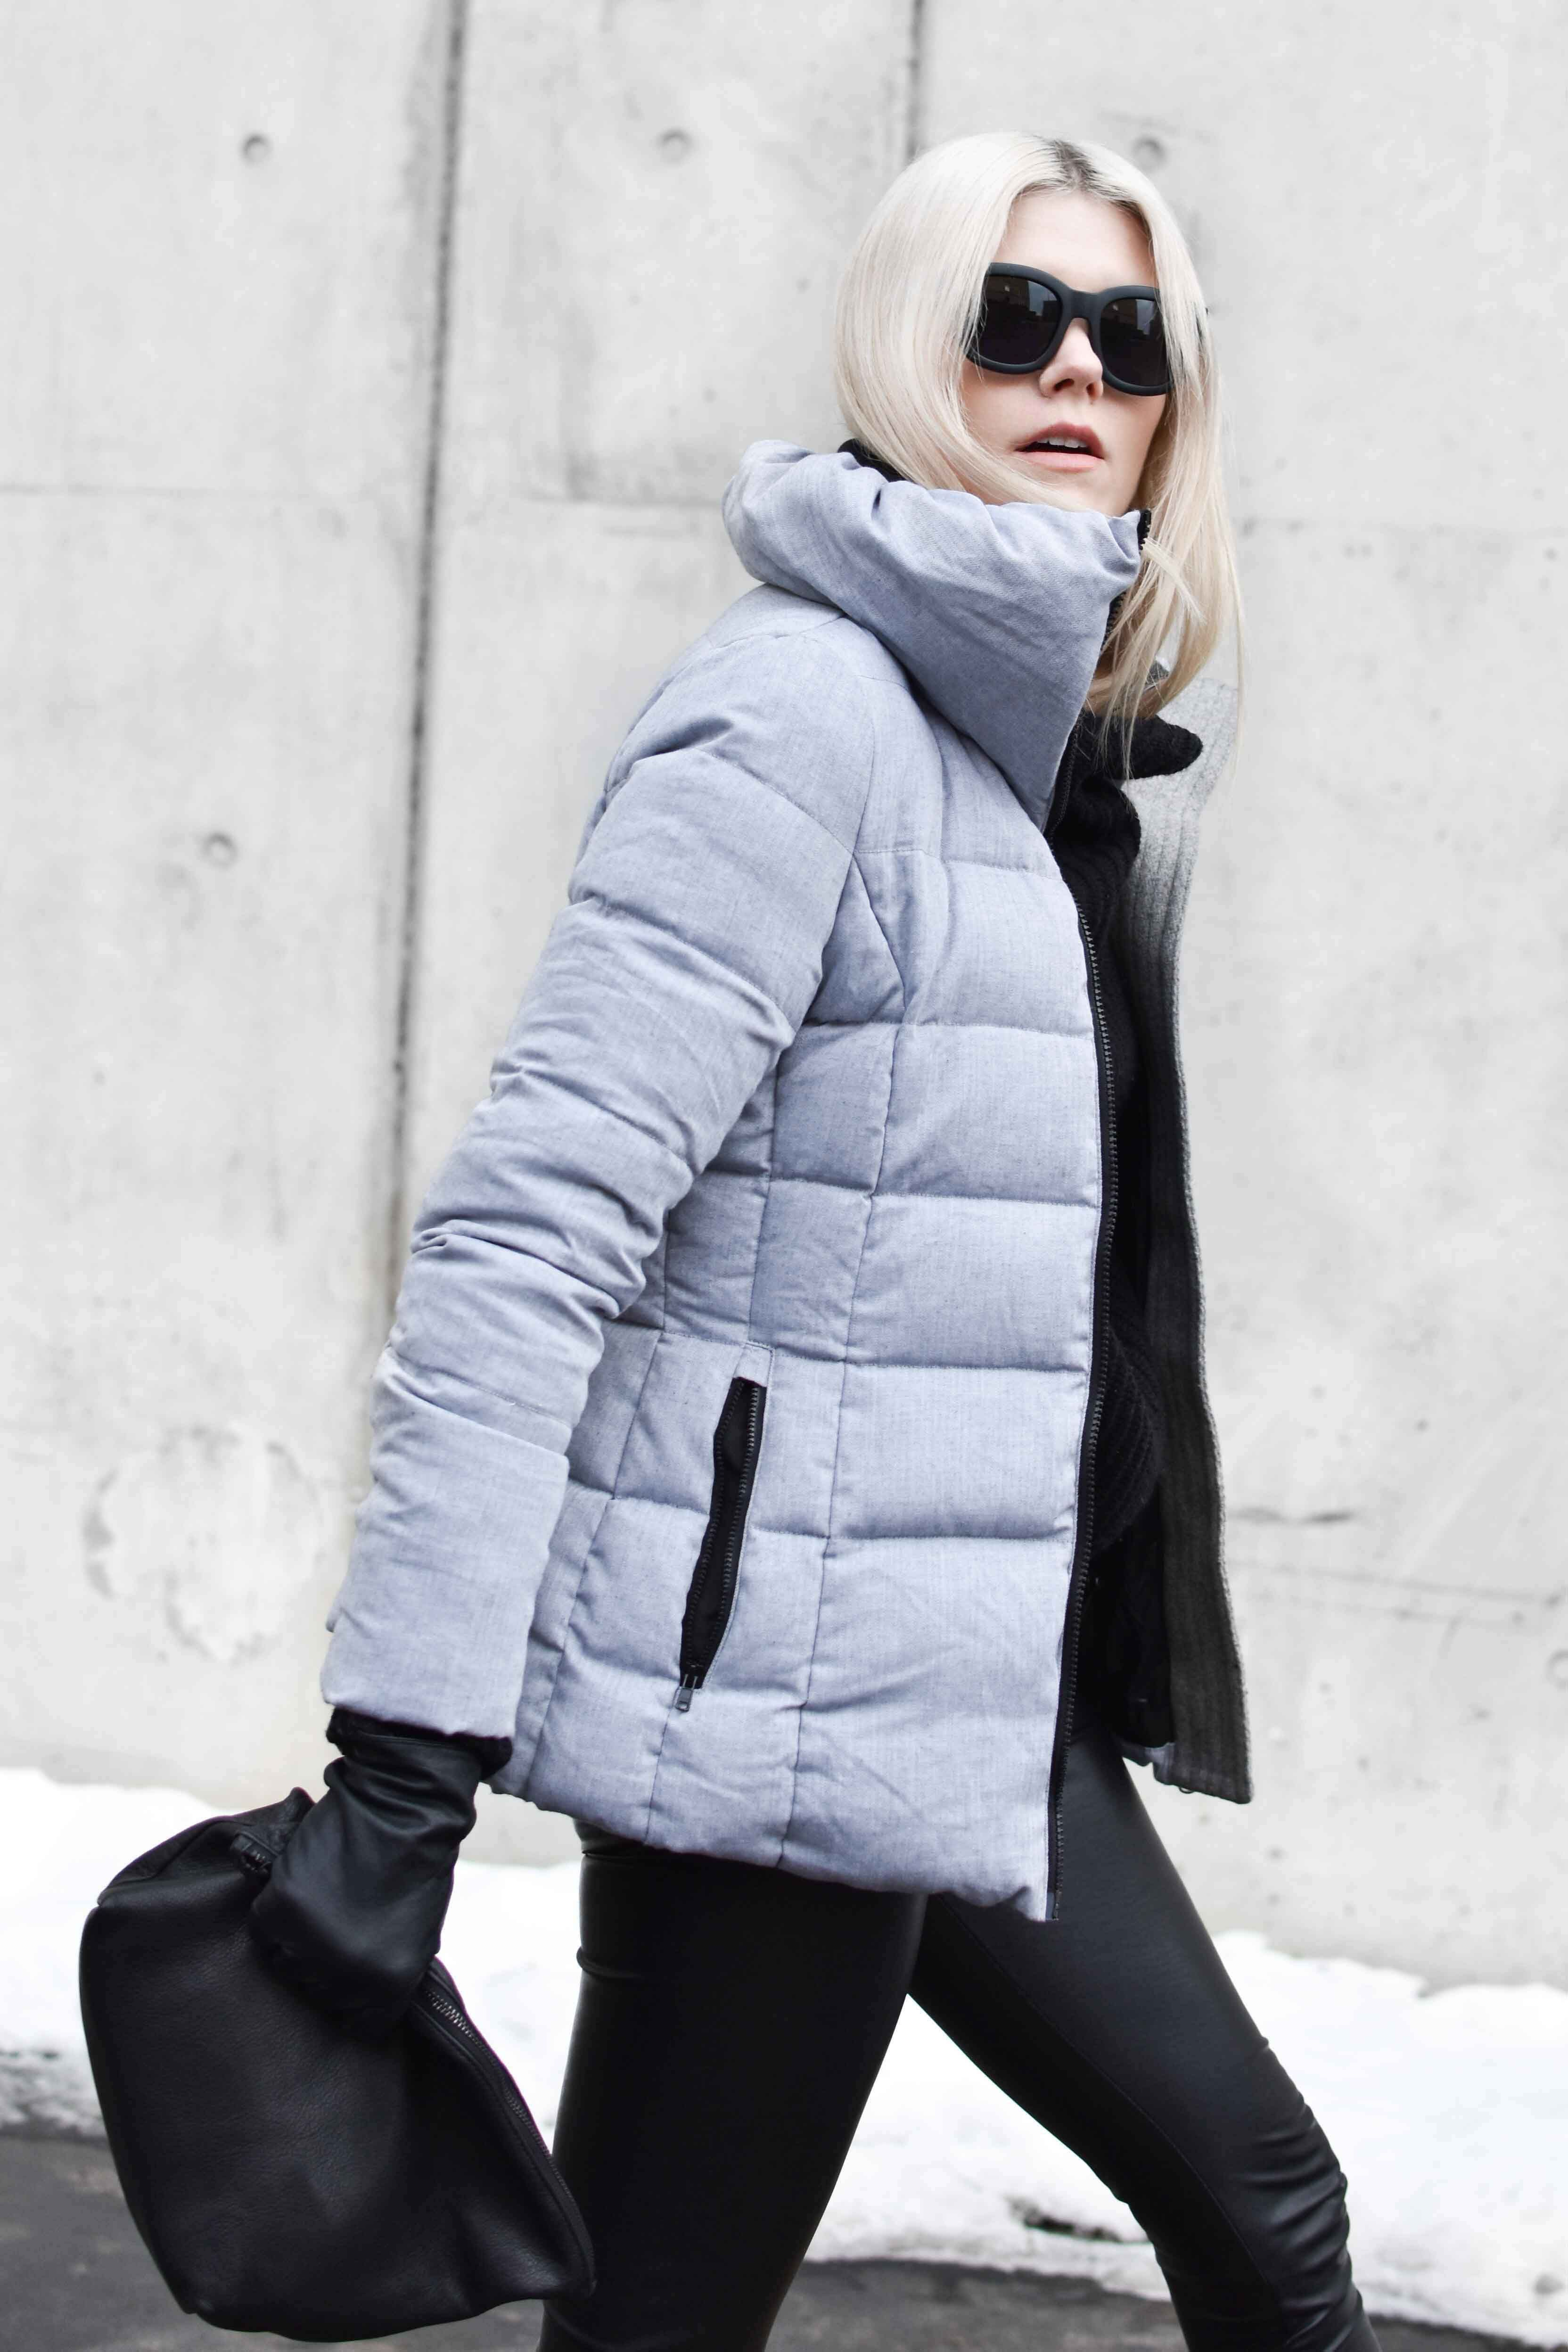 Snowman NYC Puffy Coat | blairbadge.com #minimaliststyle